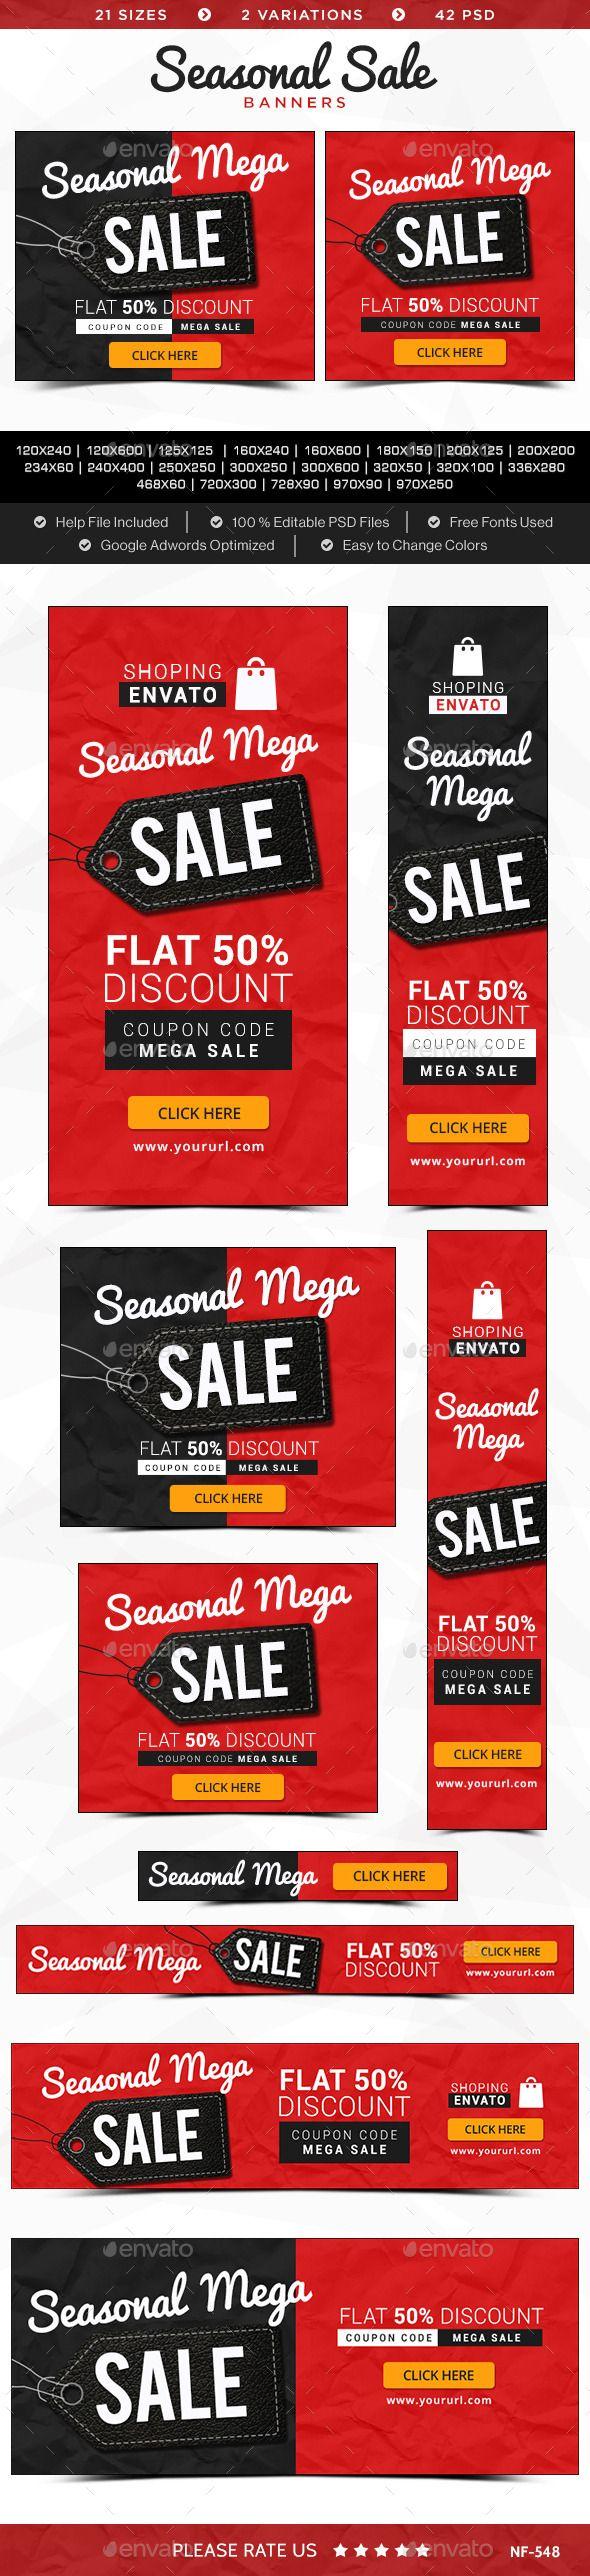 Seasonal Sale Banners Template #design #ads Download: http://graphicriver.net/item/seasonal-sale-banners/12335742?ref=ksioks